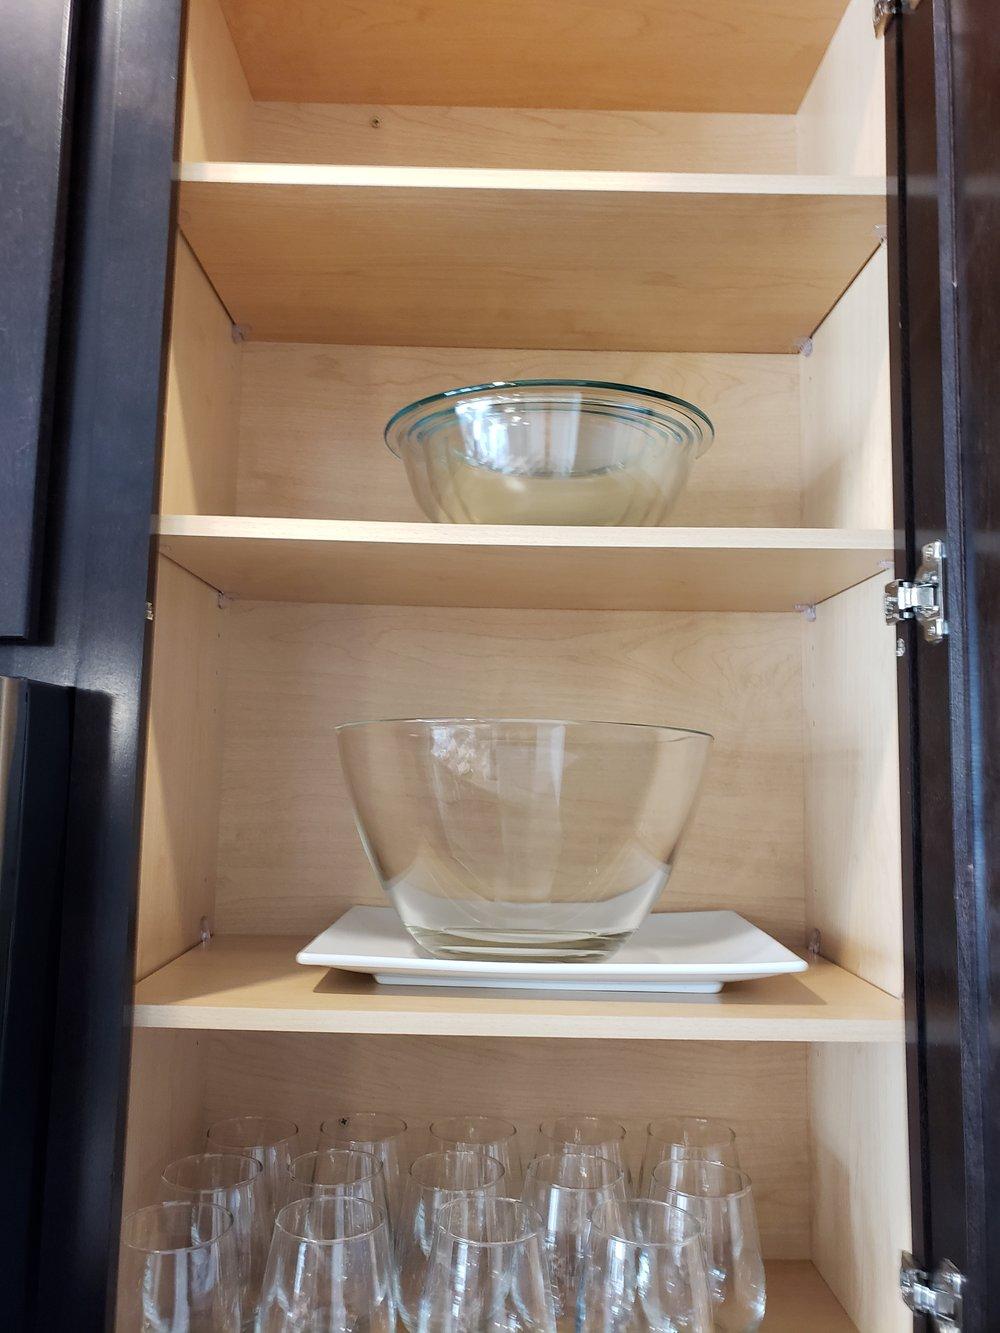 20181219_102736_Serving Pieces-Mixing Bowls.jpg